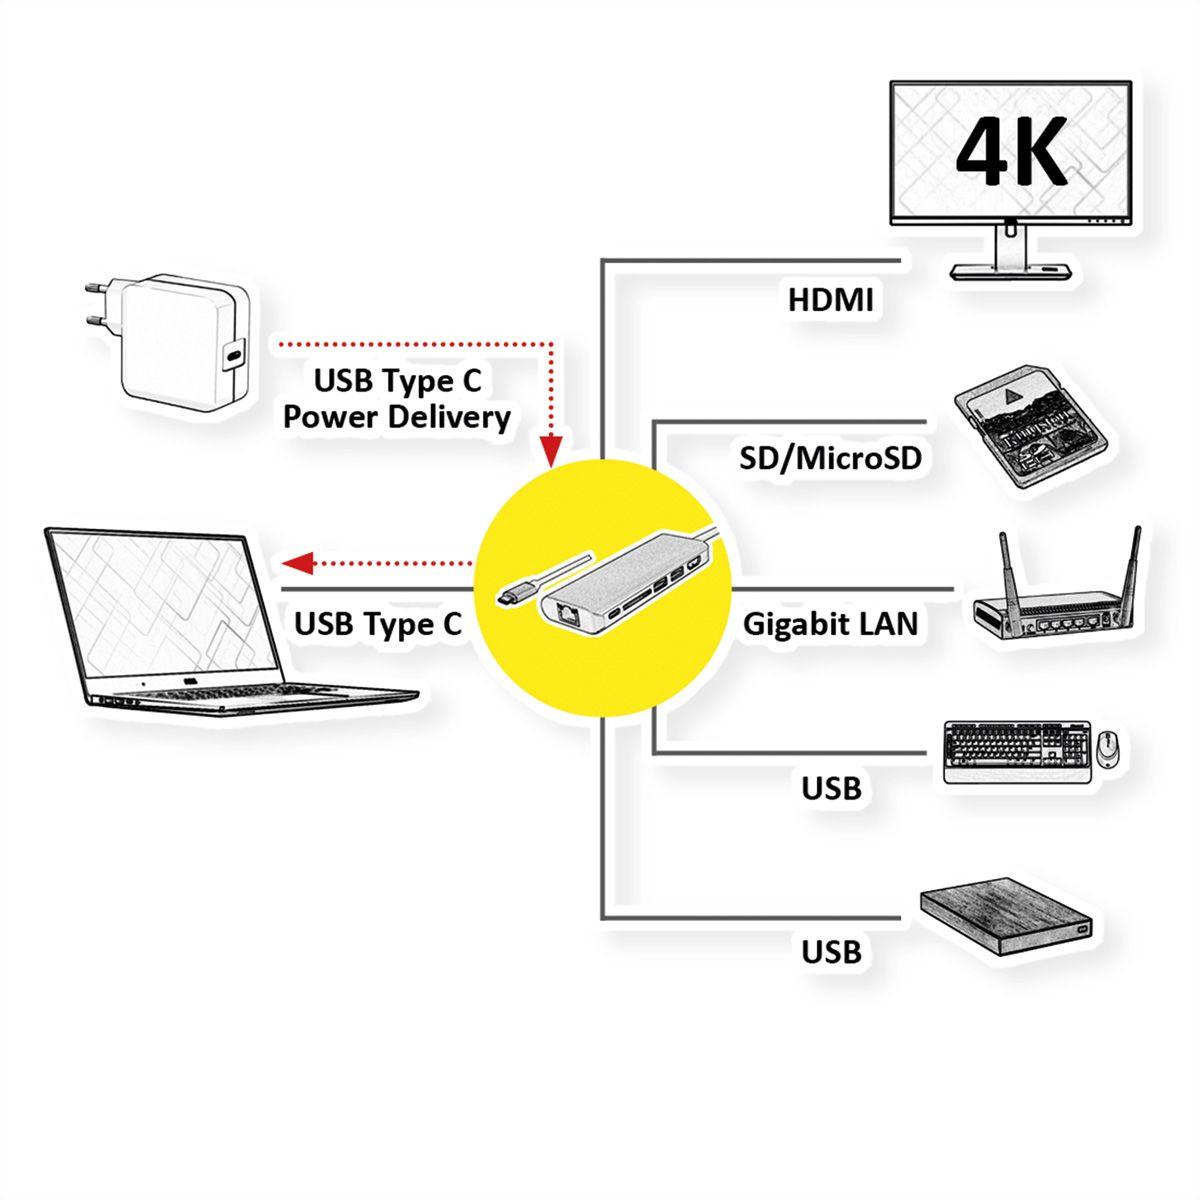 hight resolution of roline usb type c docking station 4k hdmi 2x usb 3 0 usb 3 2